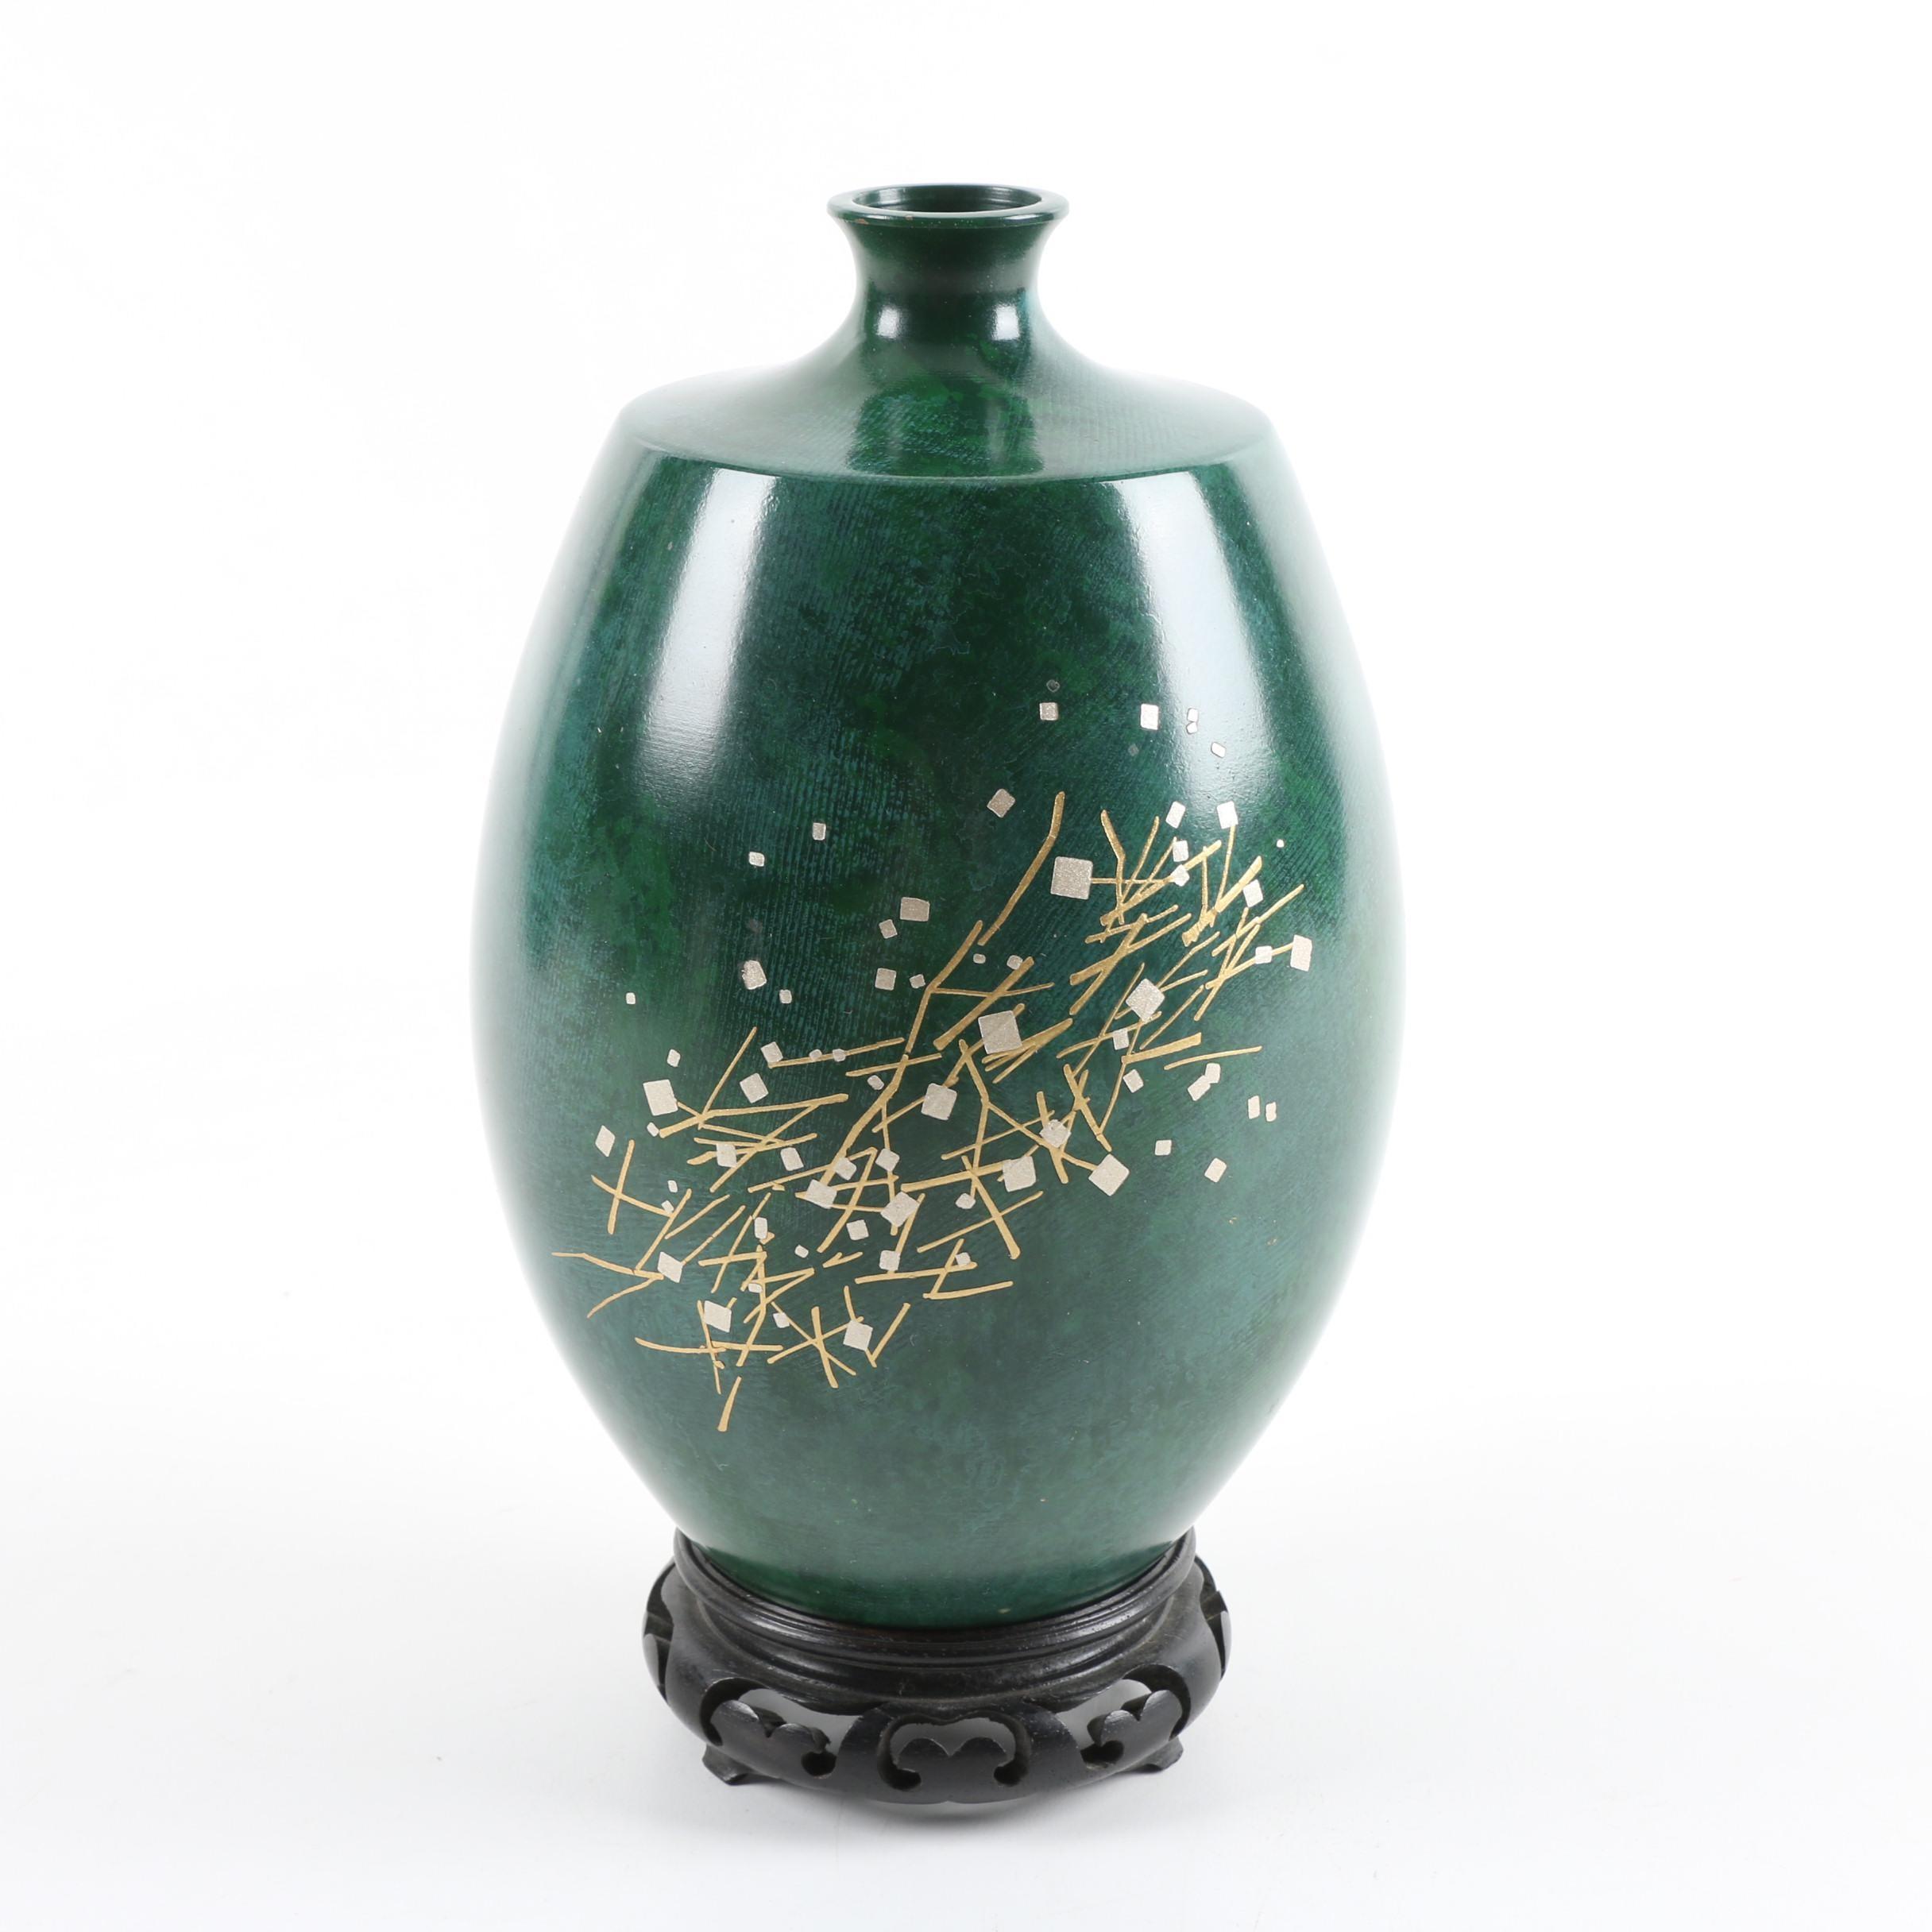 Japanese Faux Malachite Painted Brass Vase with Geometric Motif